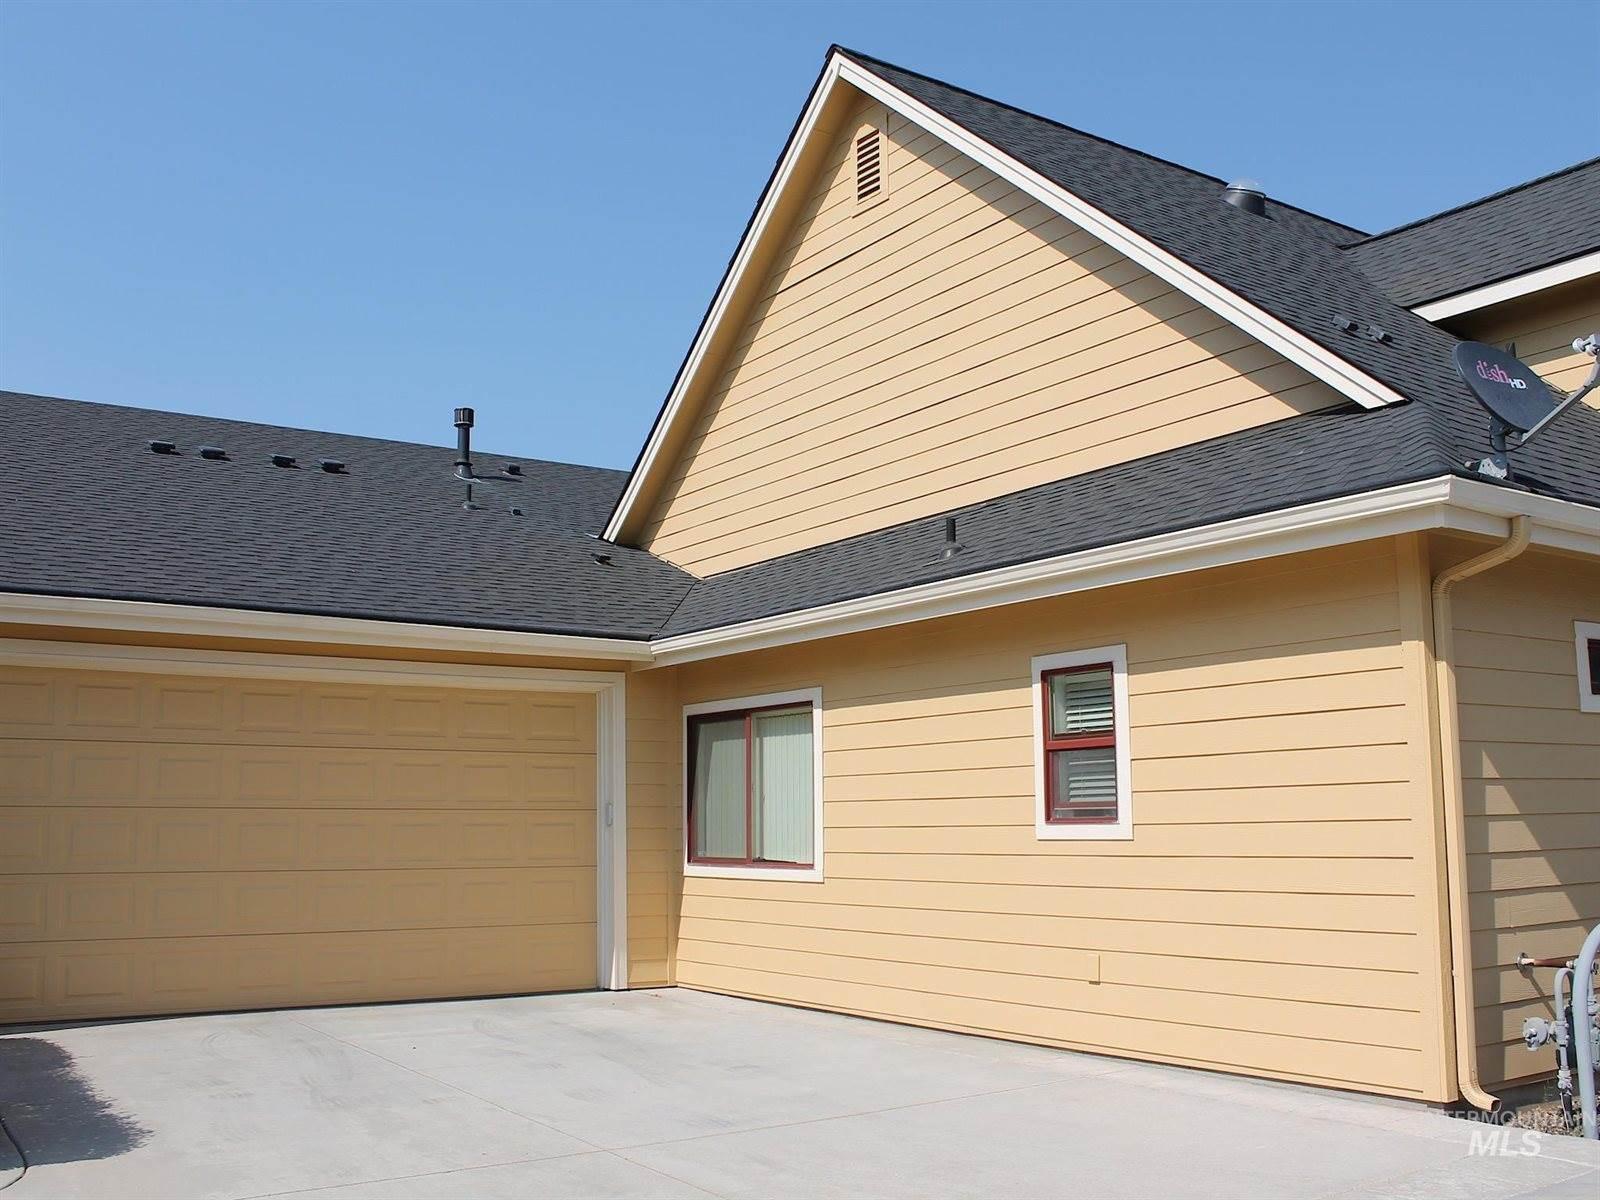 409 South Whisperwood Way, Boise, ID 83709